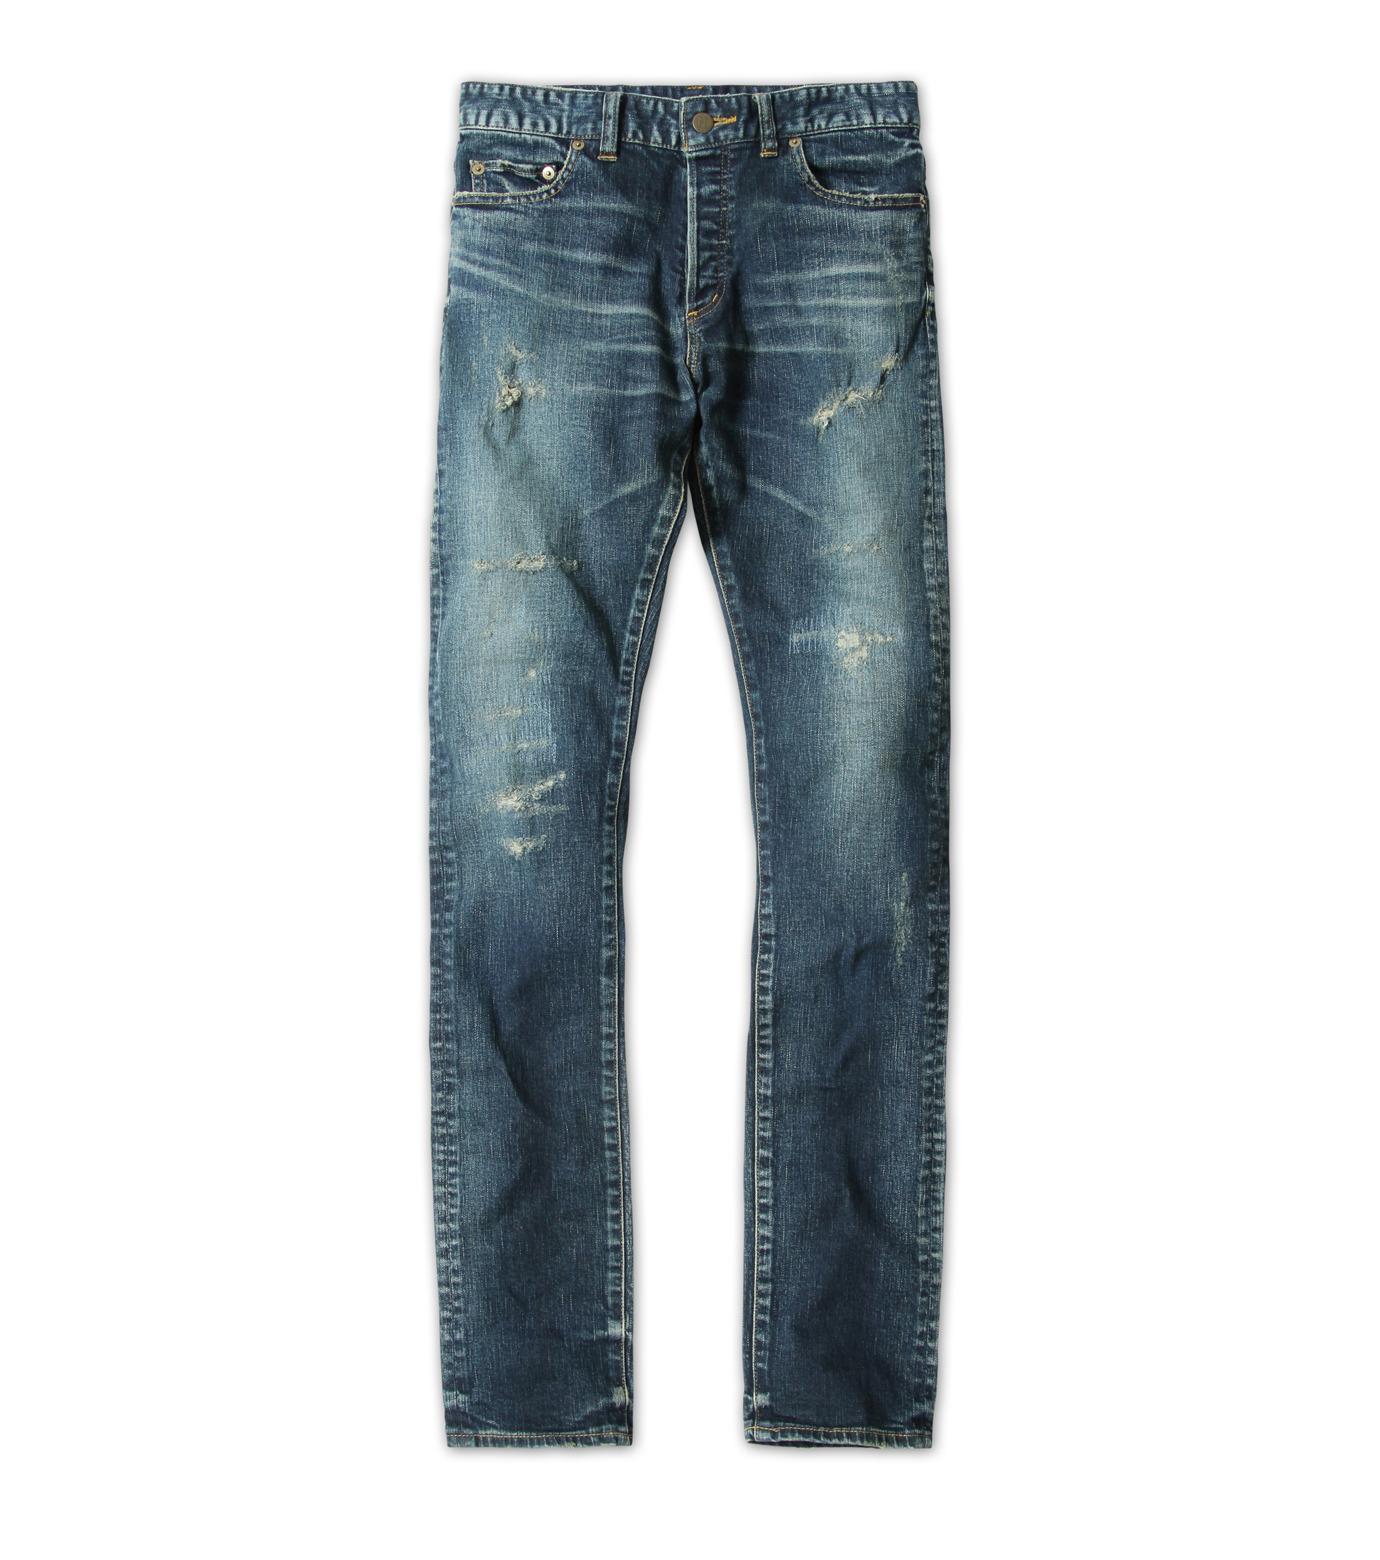 HL HEDDIE LOVU(エイチエル・エディールーヴ)のHL skinDamage-INDIGO(パンツ/pants)-HL-skinDamag-94 拡大詳細画像6